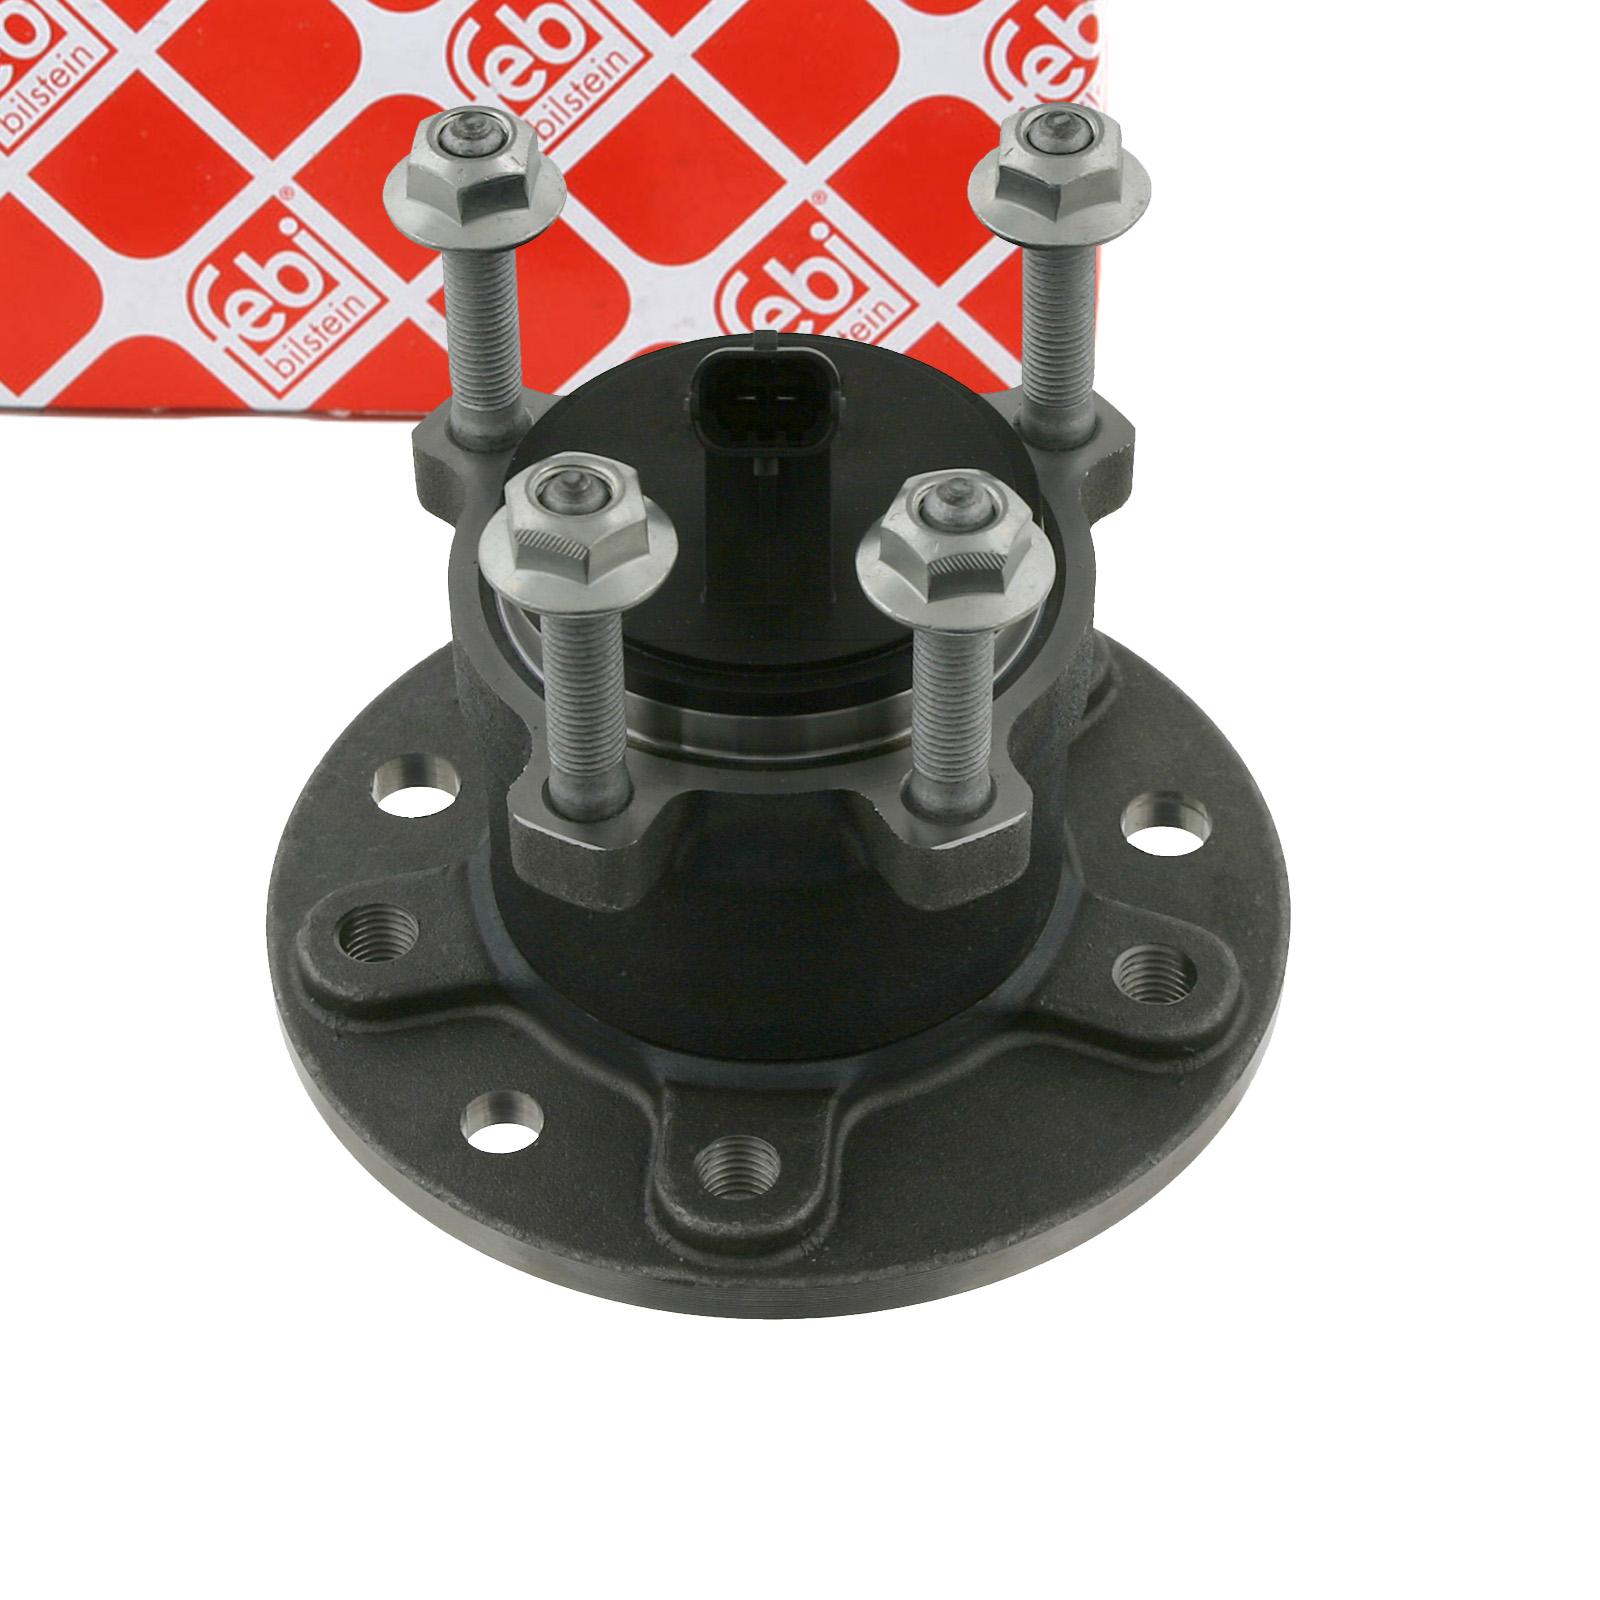 FEBI 26675 Radlagersatz Radnabe FIAT Croma (194) SAAB 9-3 (YS3F) 9-3 Kombi (E50) hinten